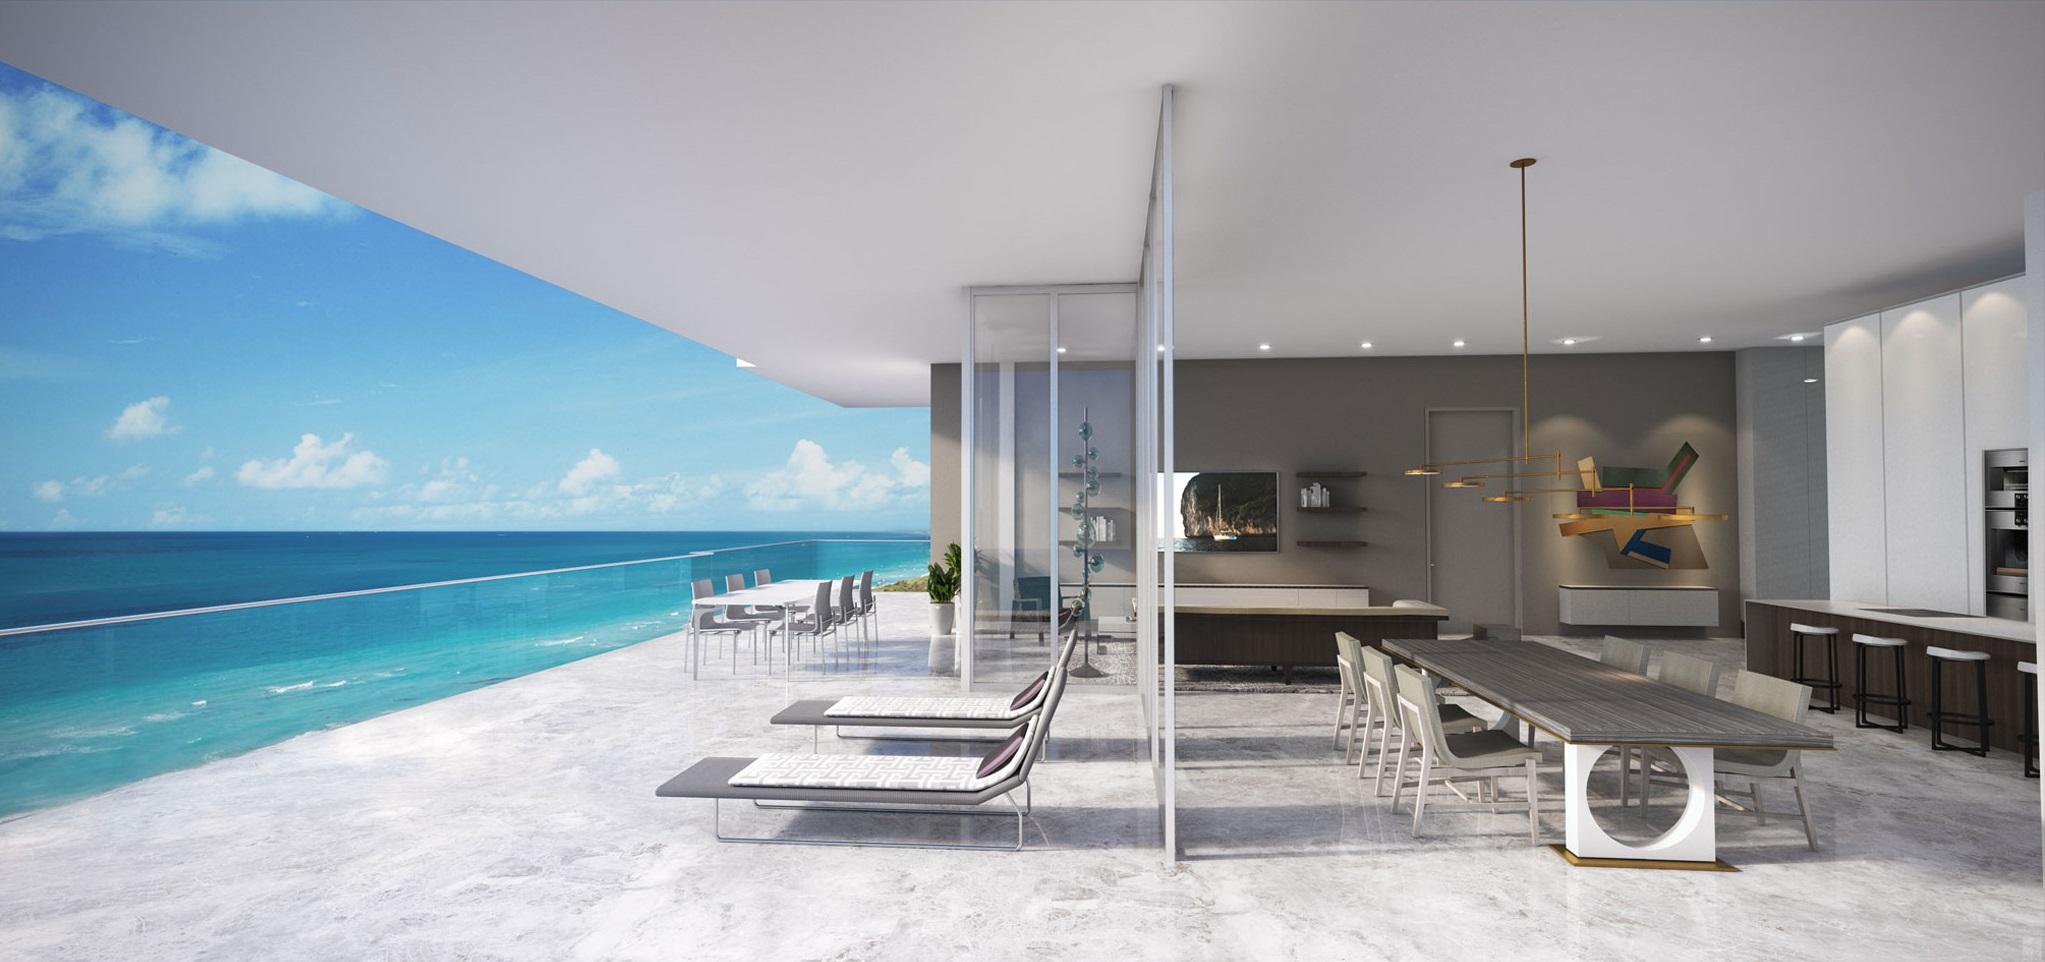 florida – miami beach homes for sale